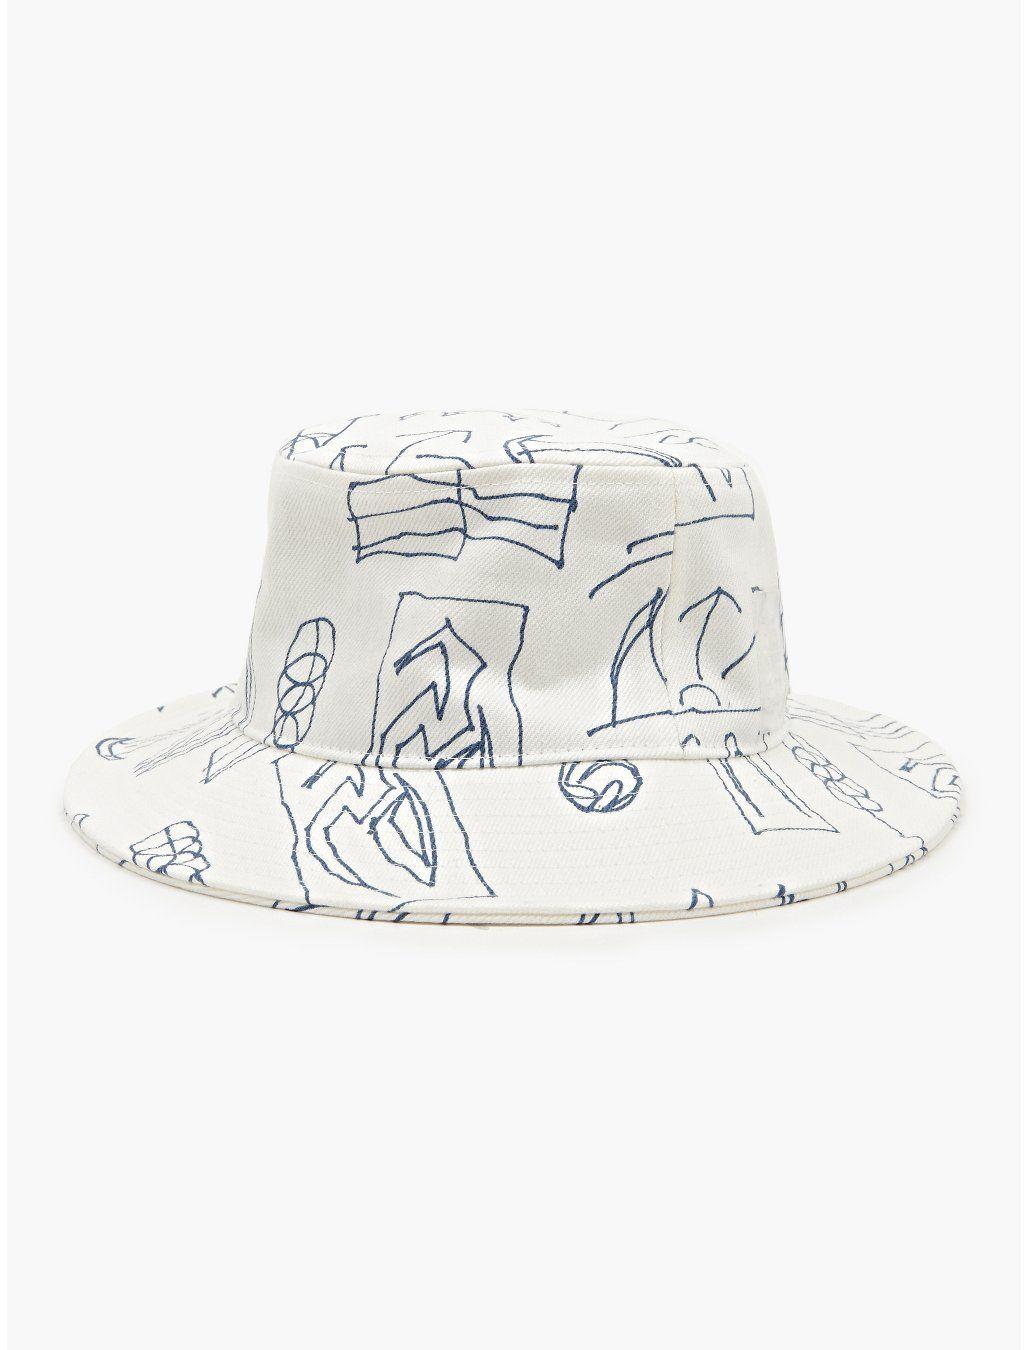 GOSHA RUBCHINSKIY WHITE DENIM PRINTED BUCKET HAT  717fd0da01c